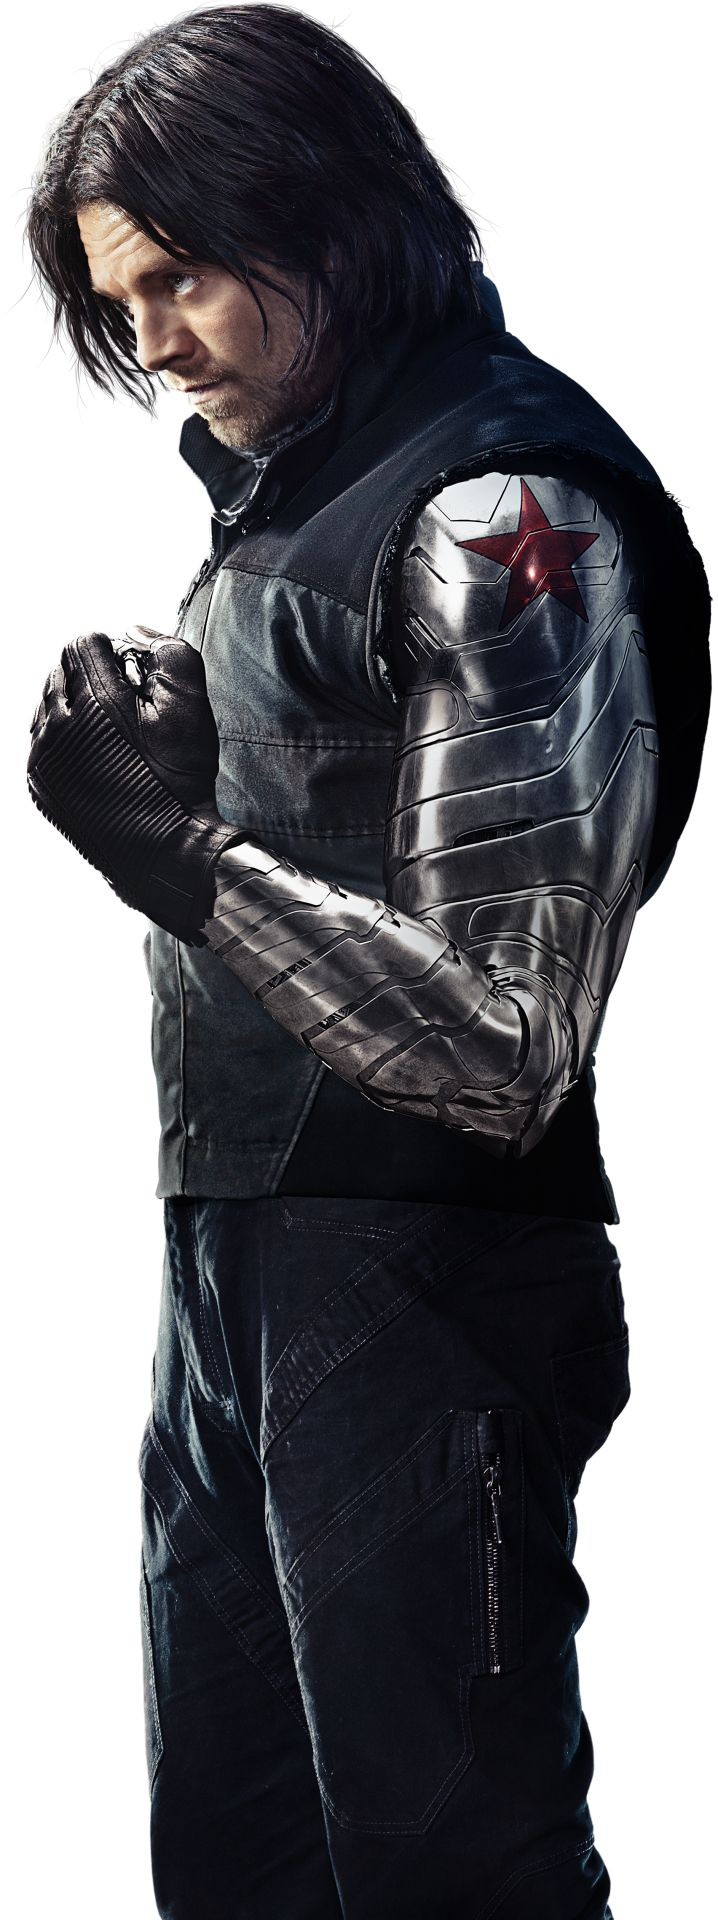 The Metal Arm